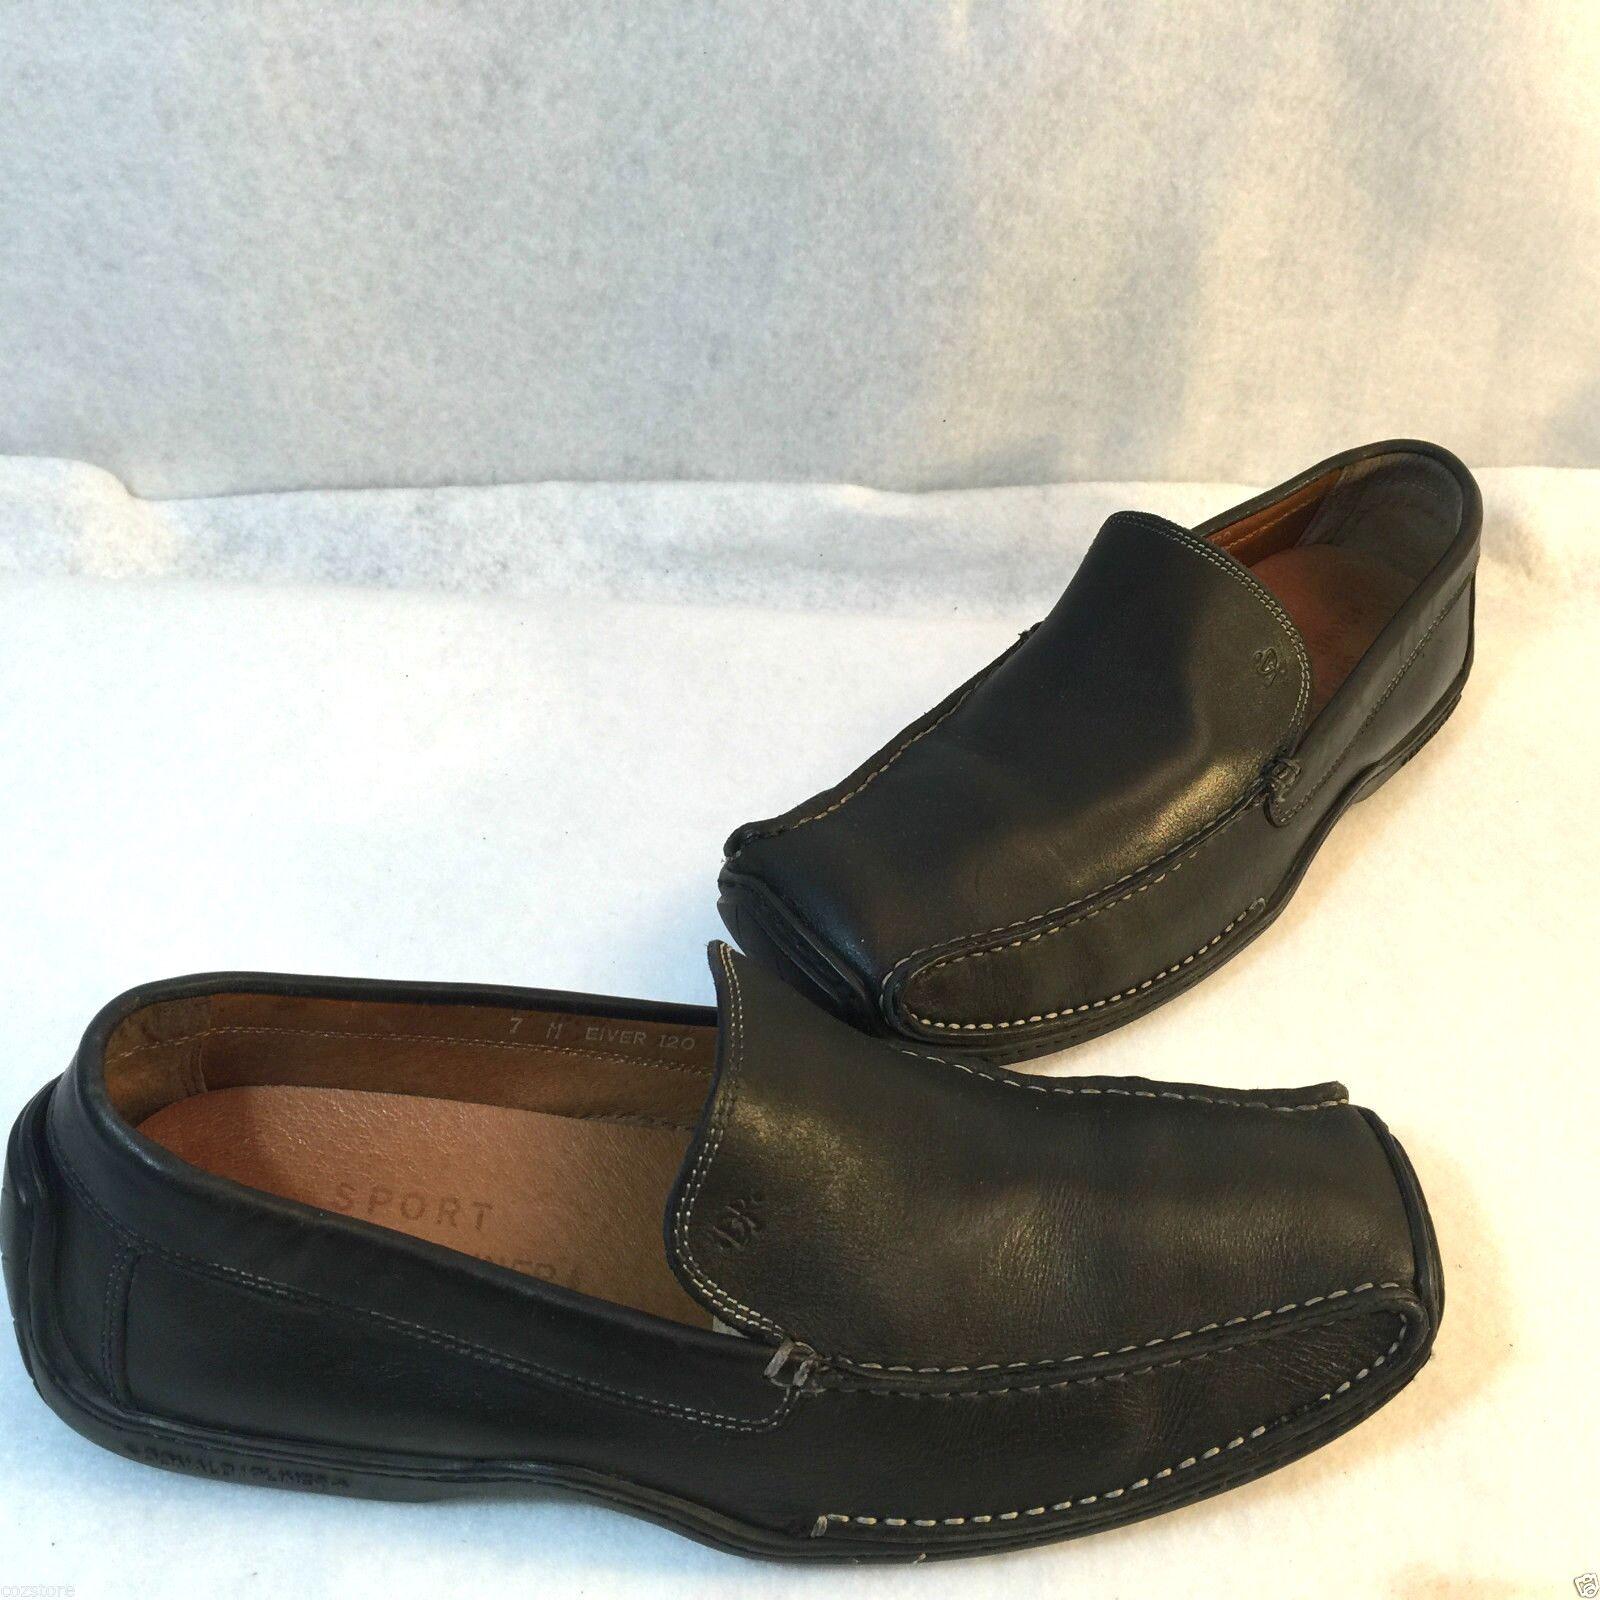 Donald Pliner Eiver Slip On Loafer Driving Moc Black Vachetta Leather shoes 7 M